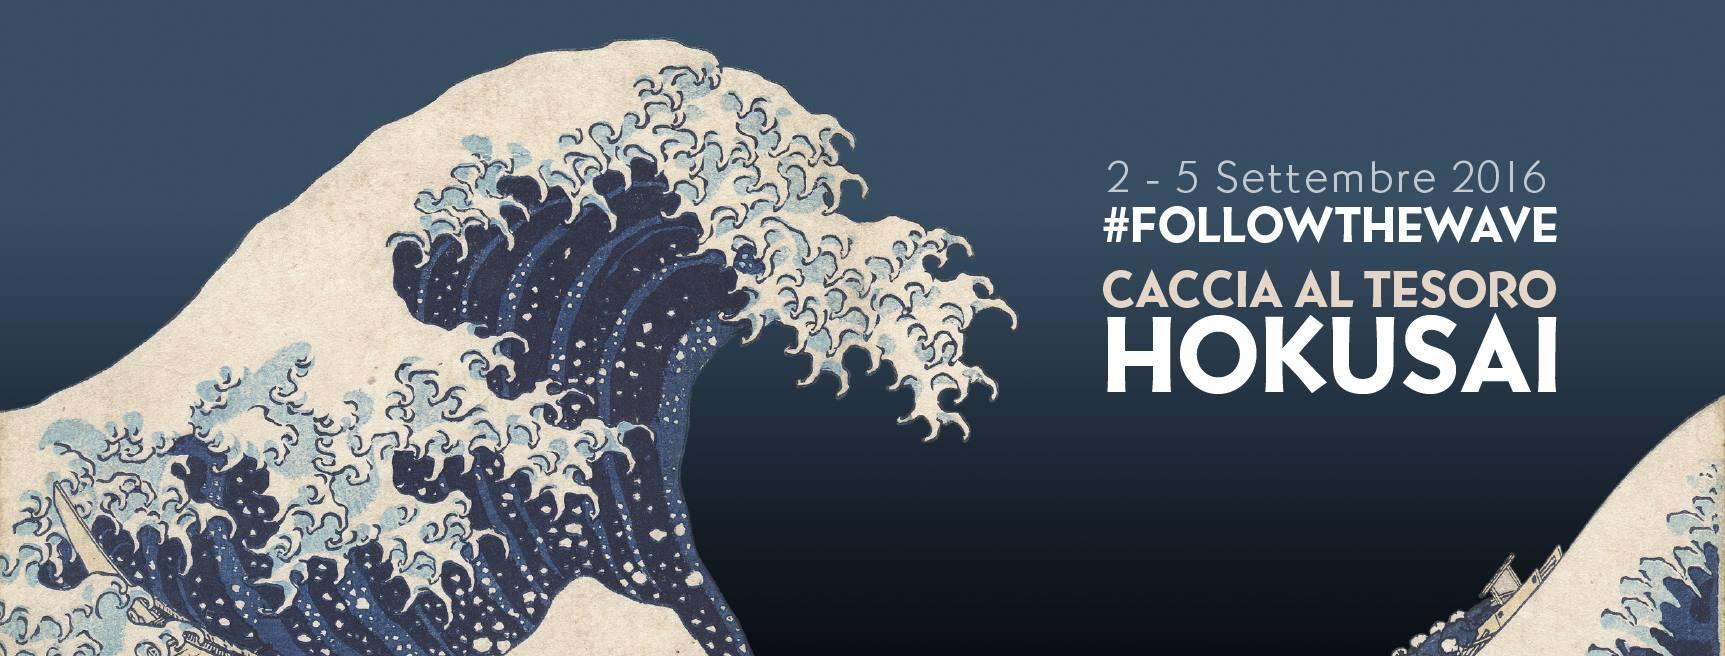 #followthewave: parte la caccia al tesoro di Hokusai